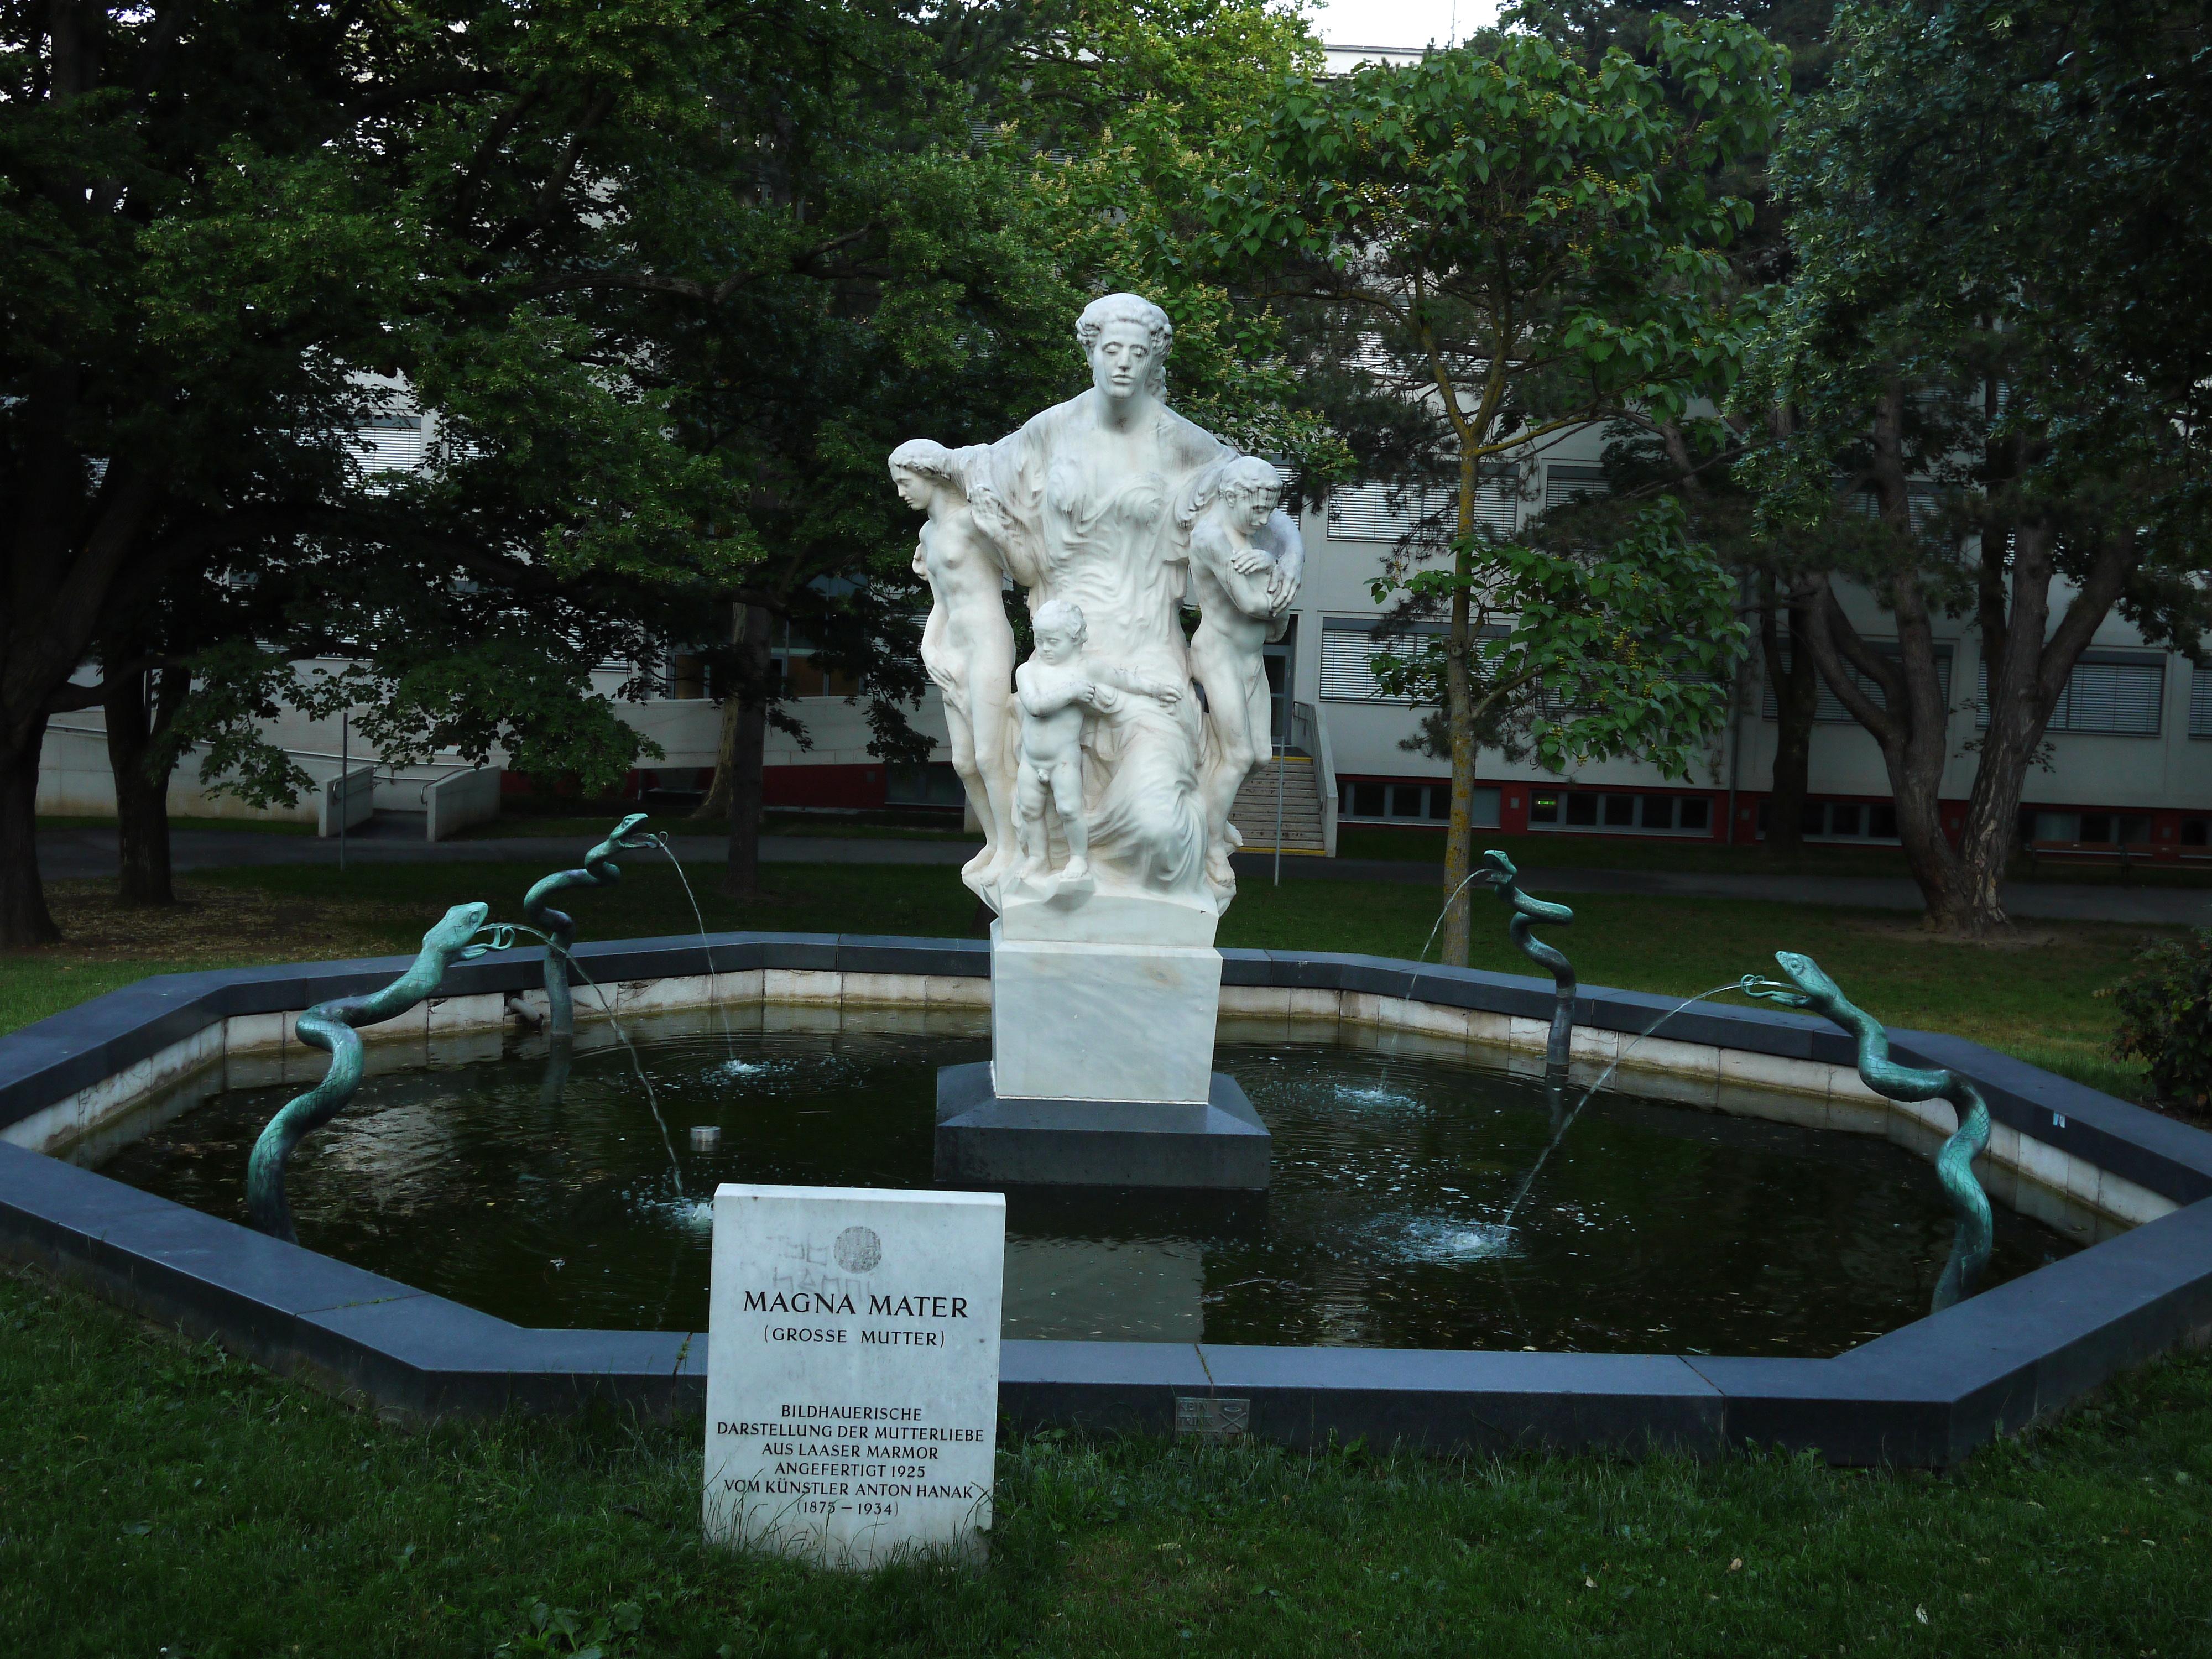 Maurer_Rathauspark_Magna_Mater_Brunnen.JPG